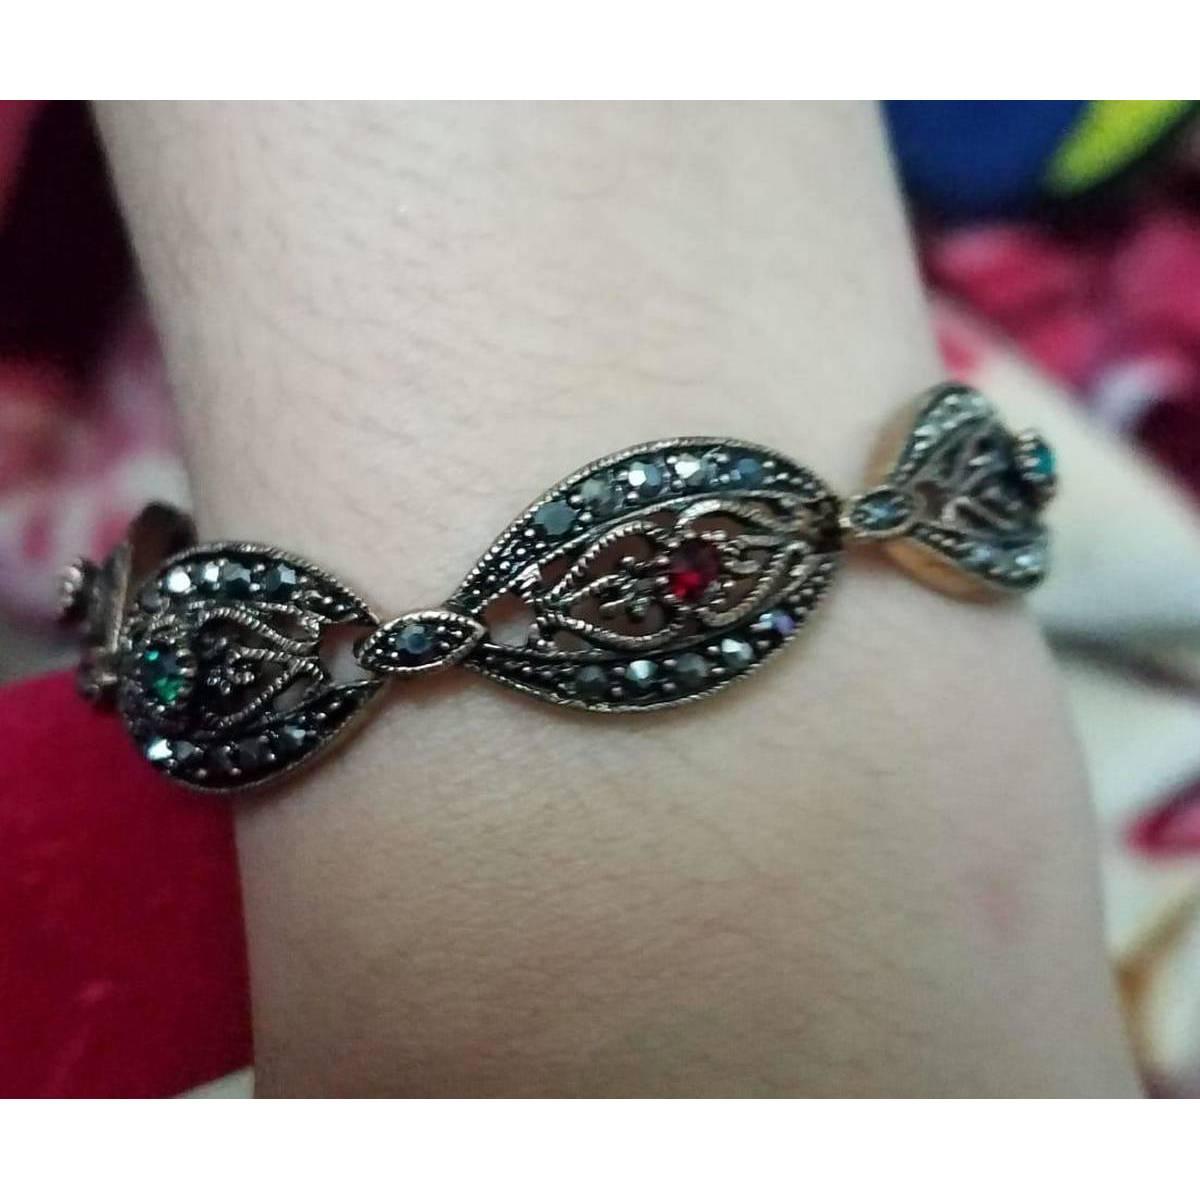 Turkish style bracelet fashion traditional bracelets for girls women trend 2020